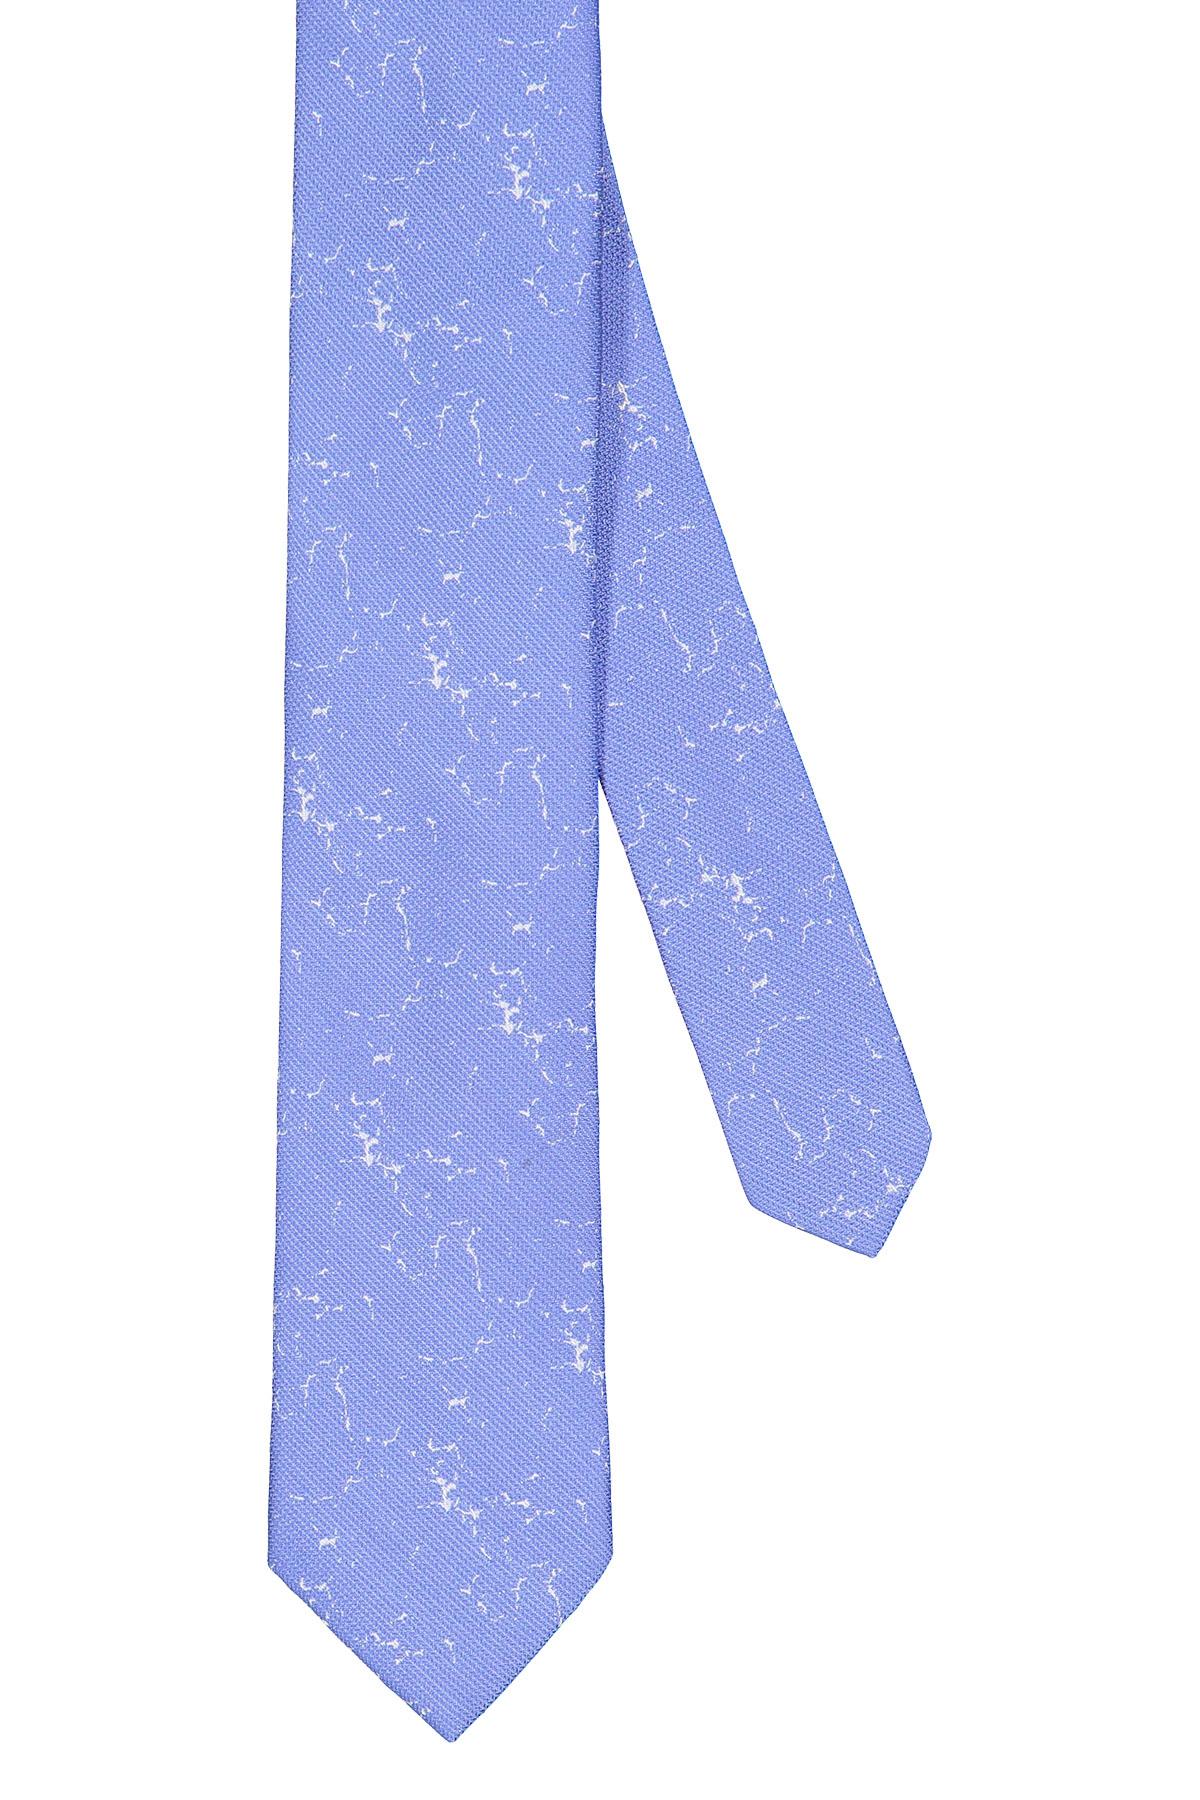 Corbata Calvin Klein, seda mezcla, celeste con fantasía en blanco.